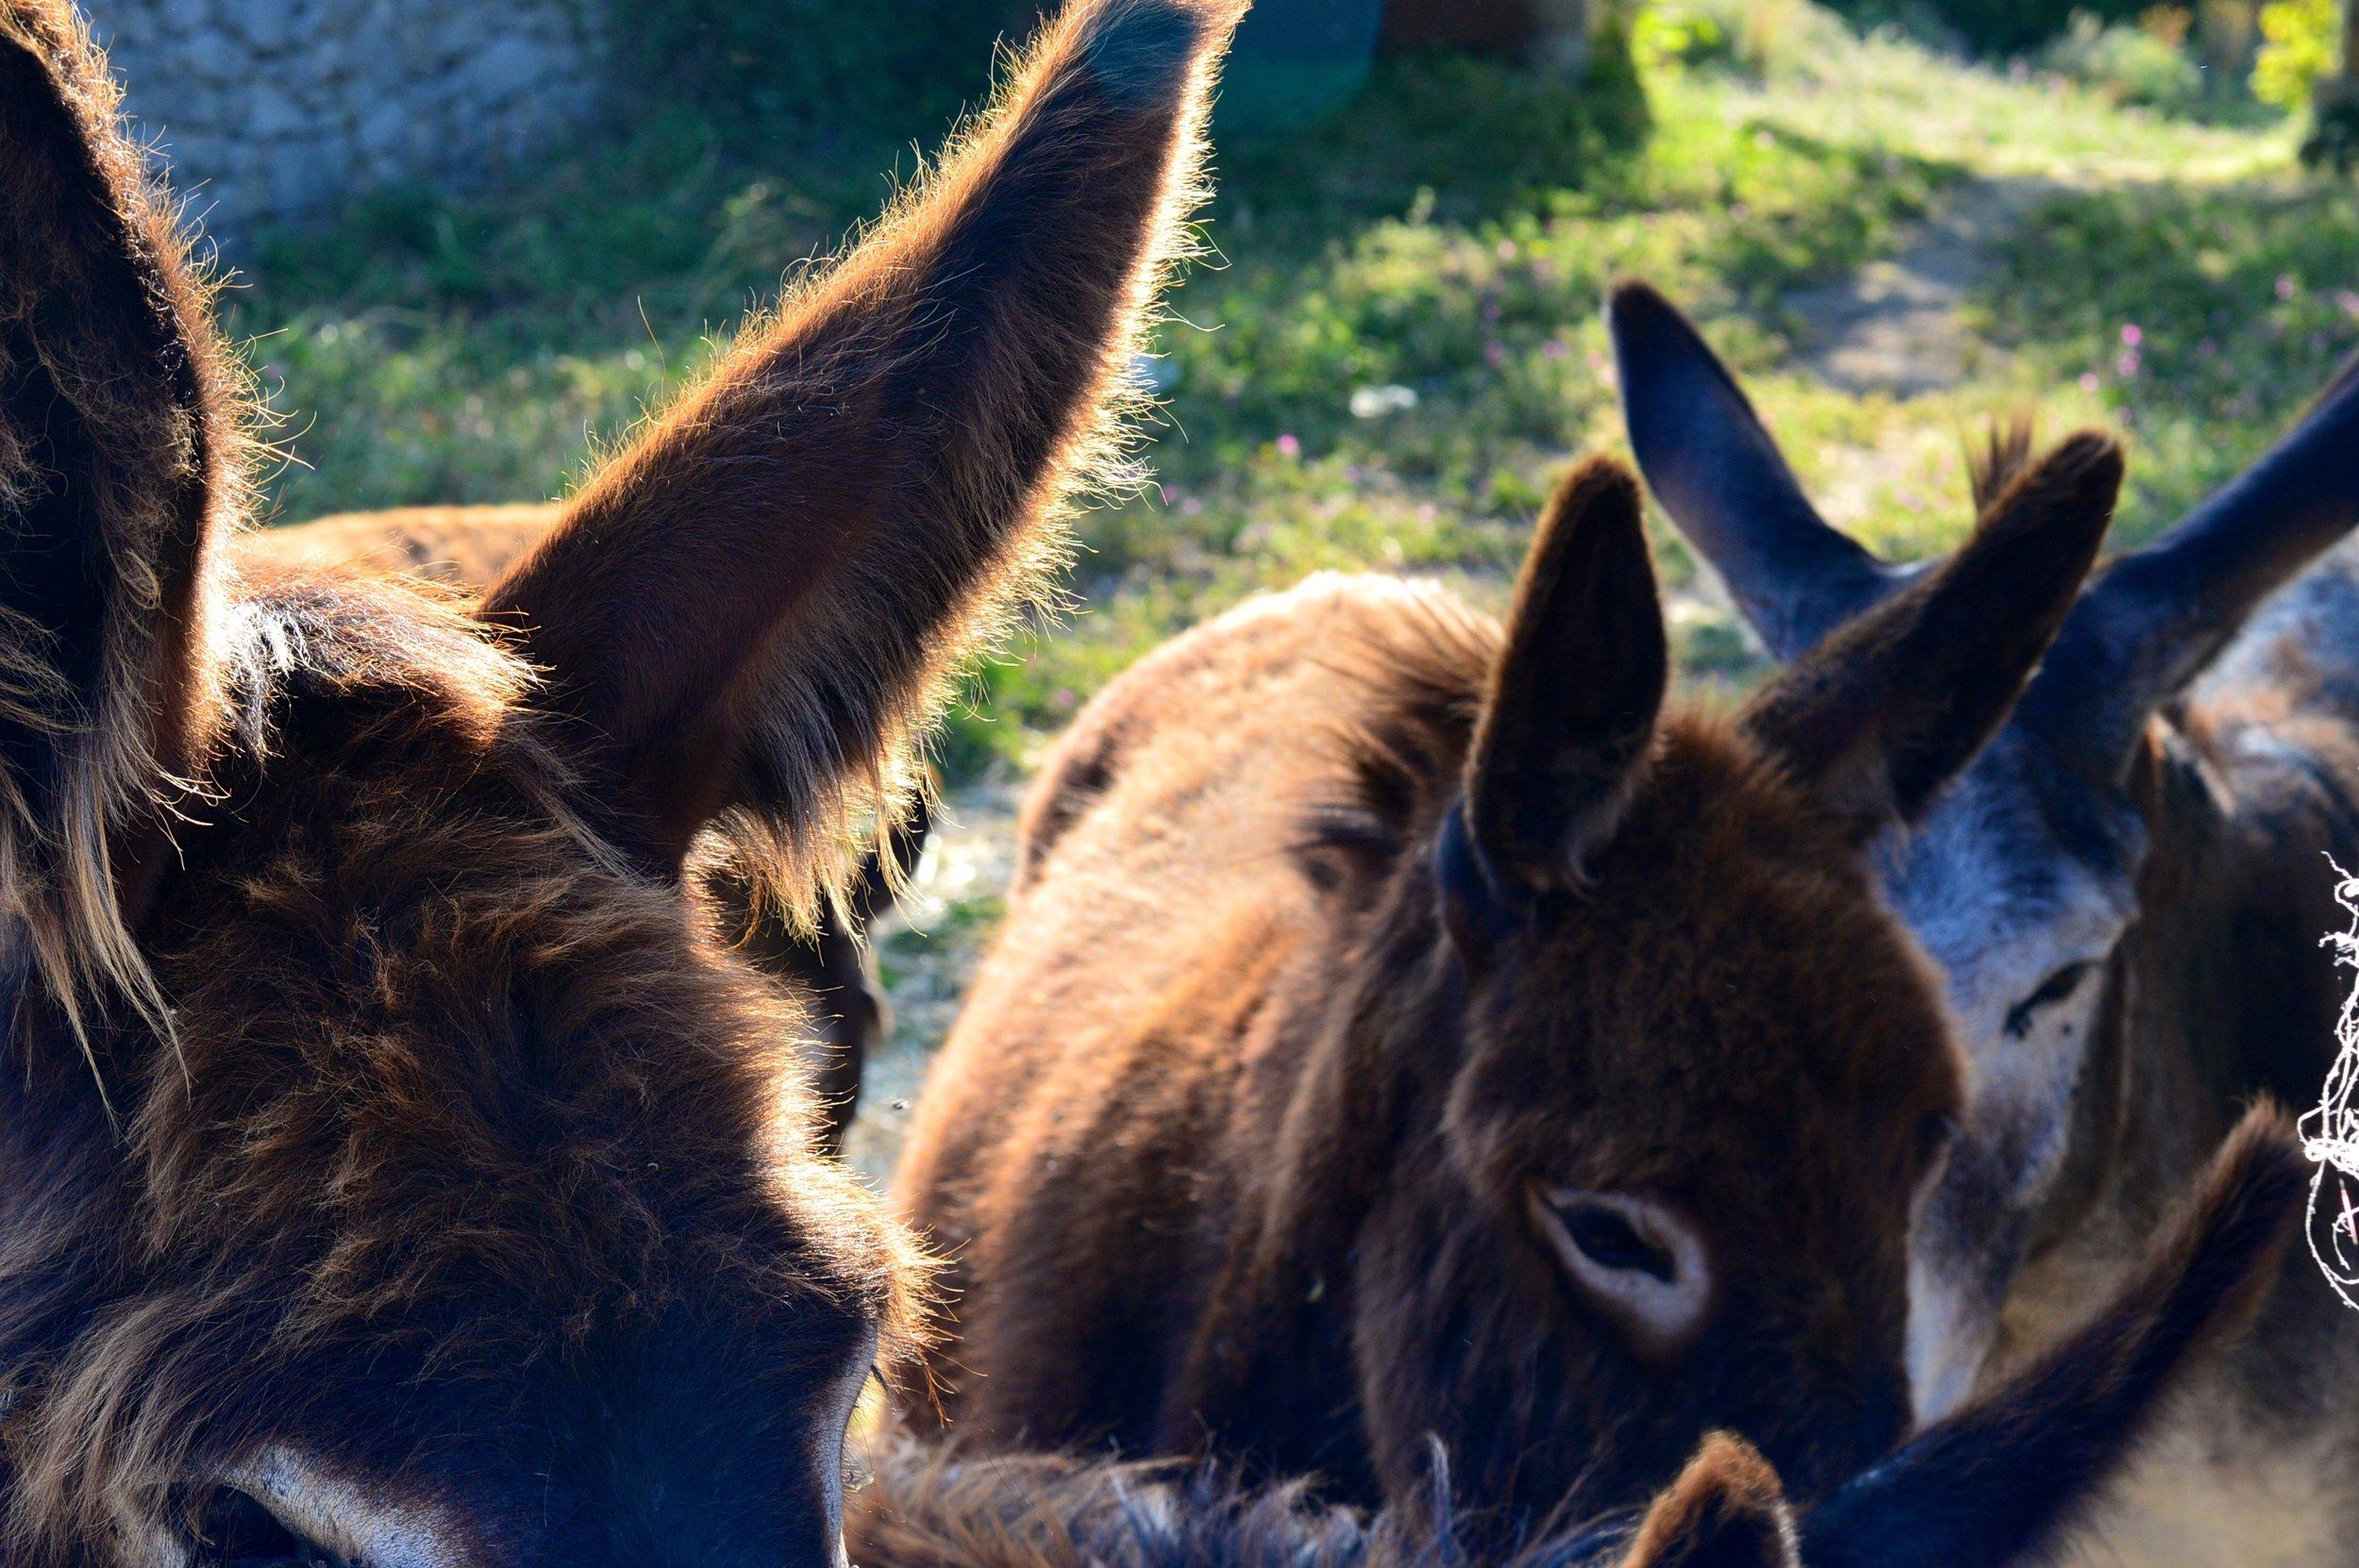 Donkeys in Sicily